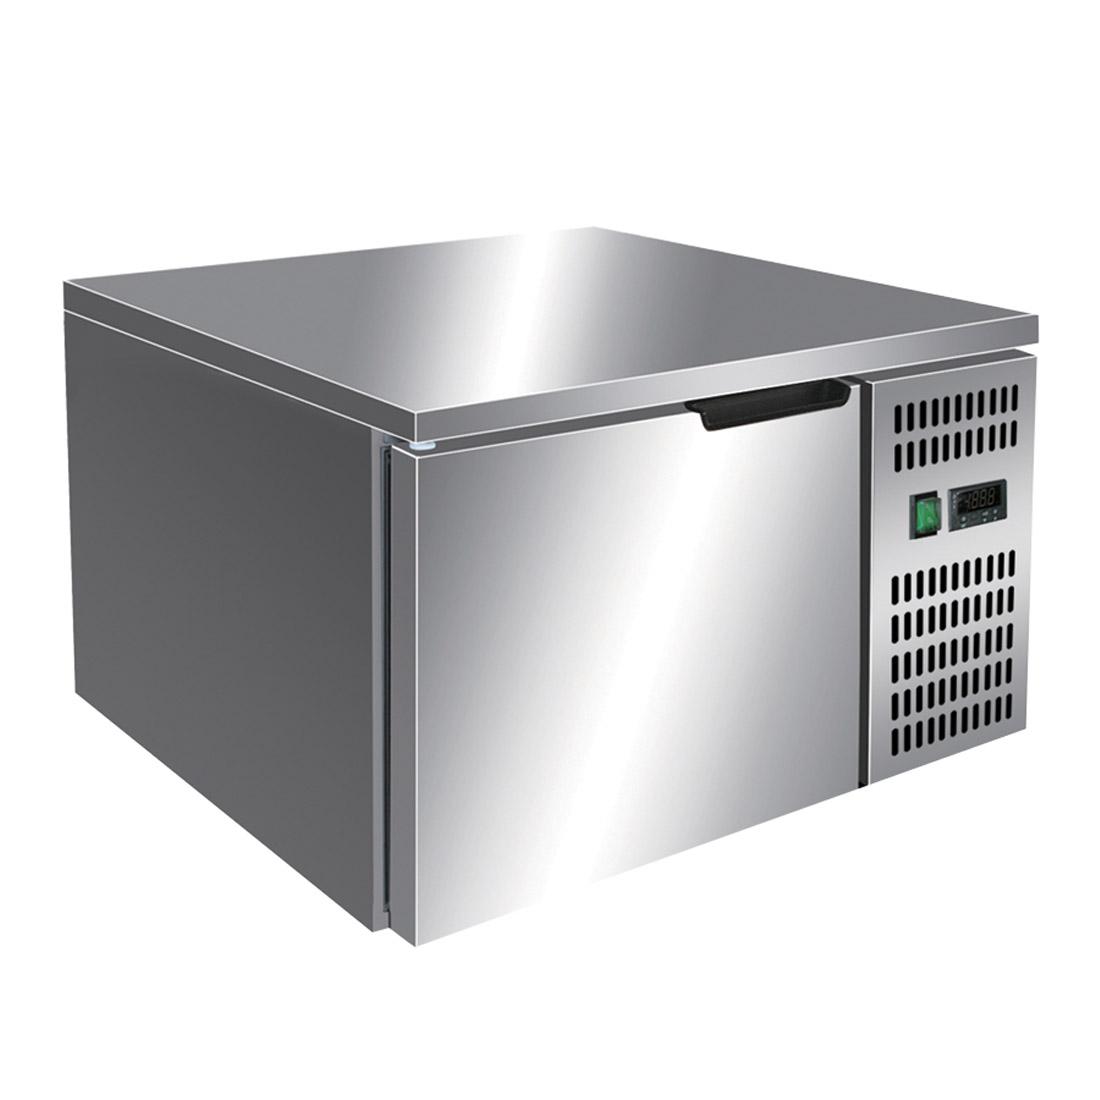 ABT3 Counter Top Blast Chiller & Freezer 3 Trays